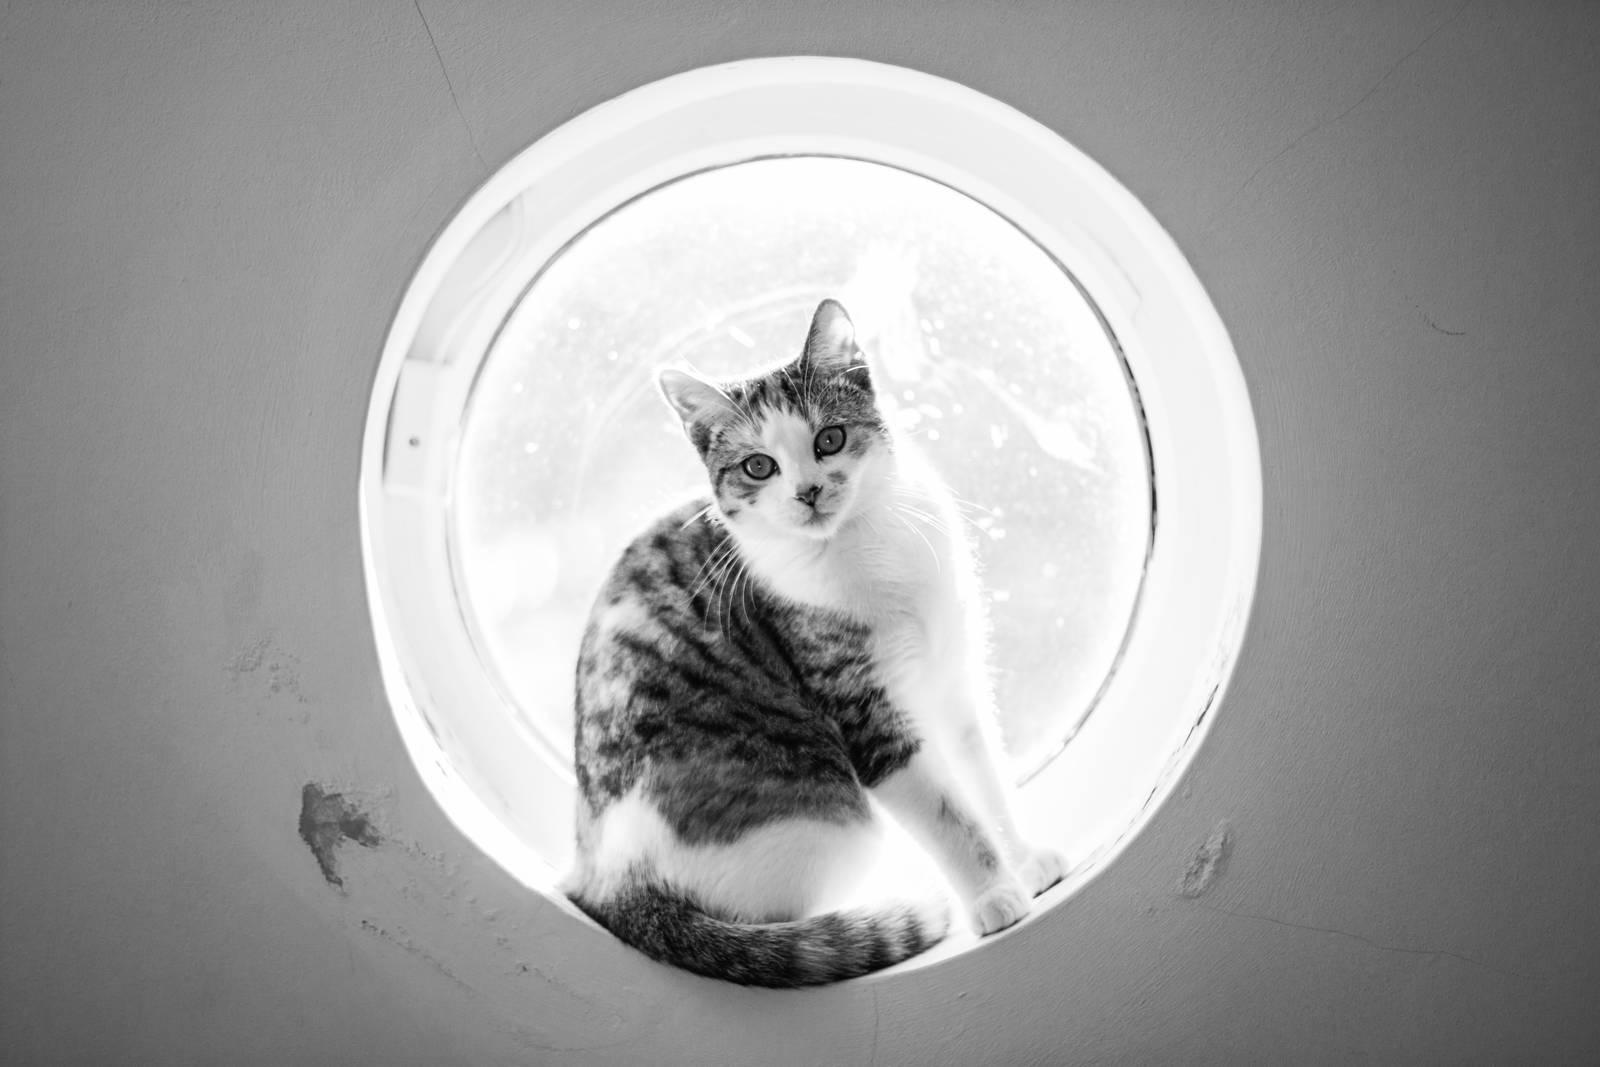 Cookie in a windowsill